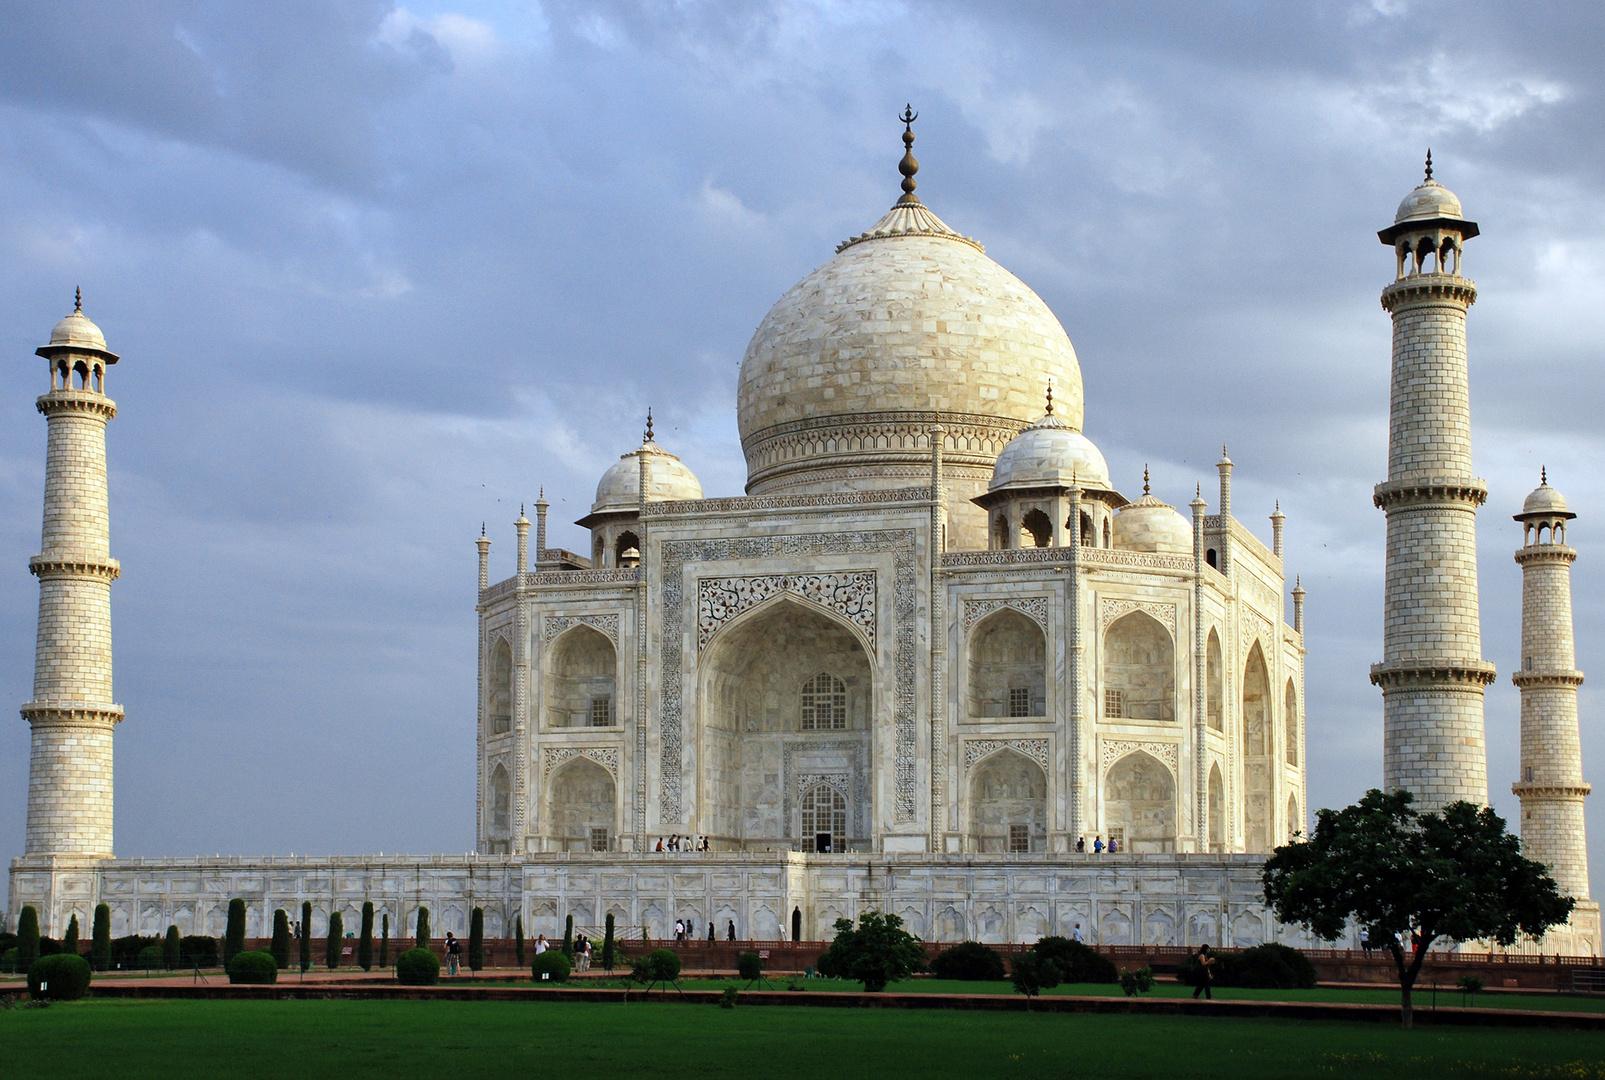 Templi e palazzi - Agra